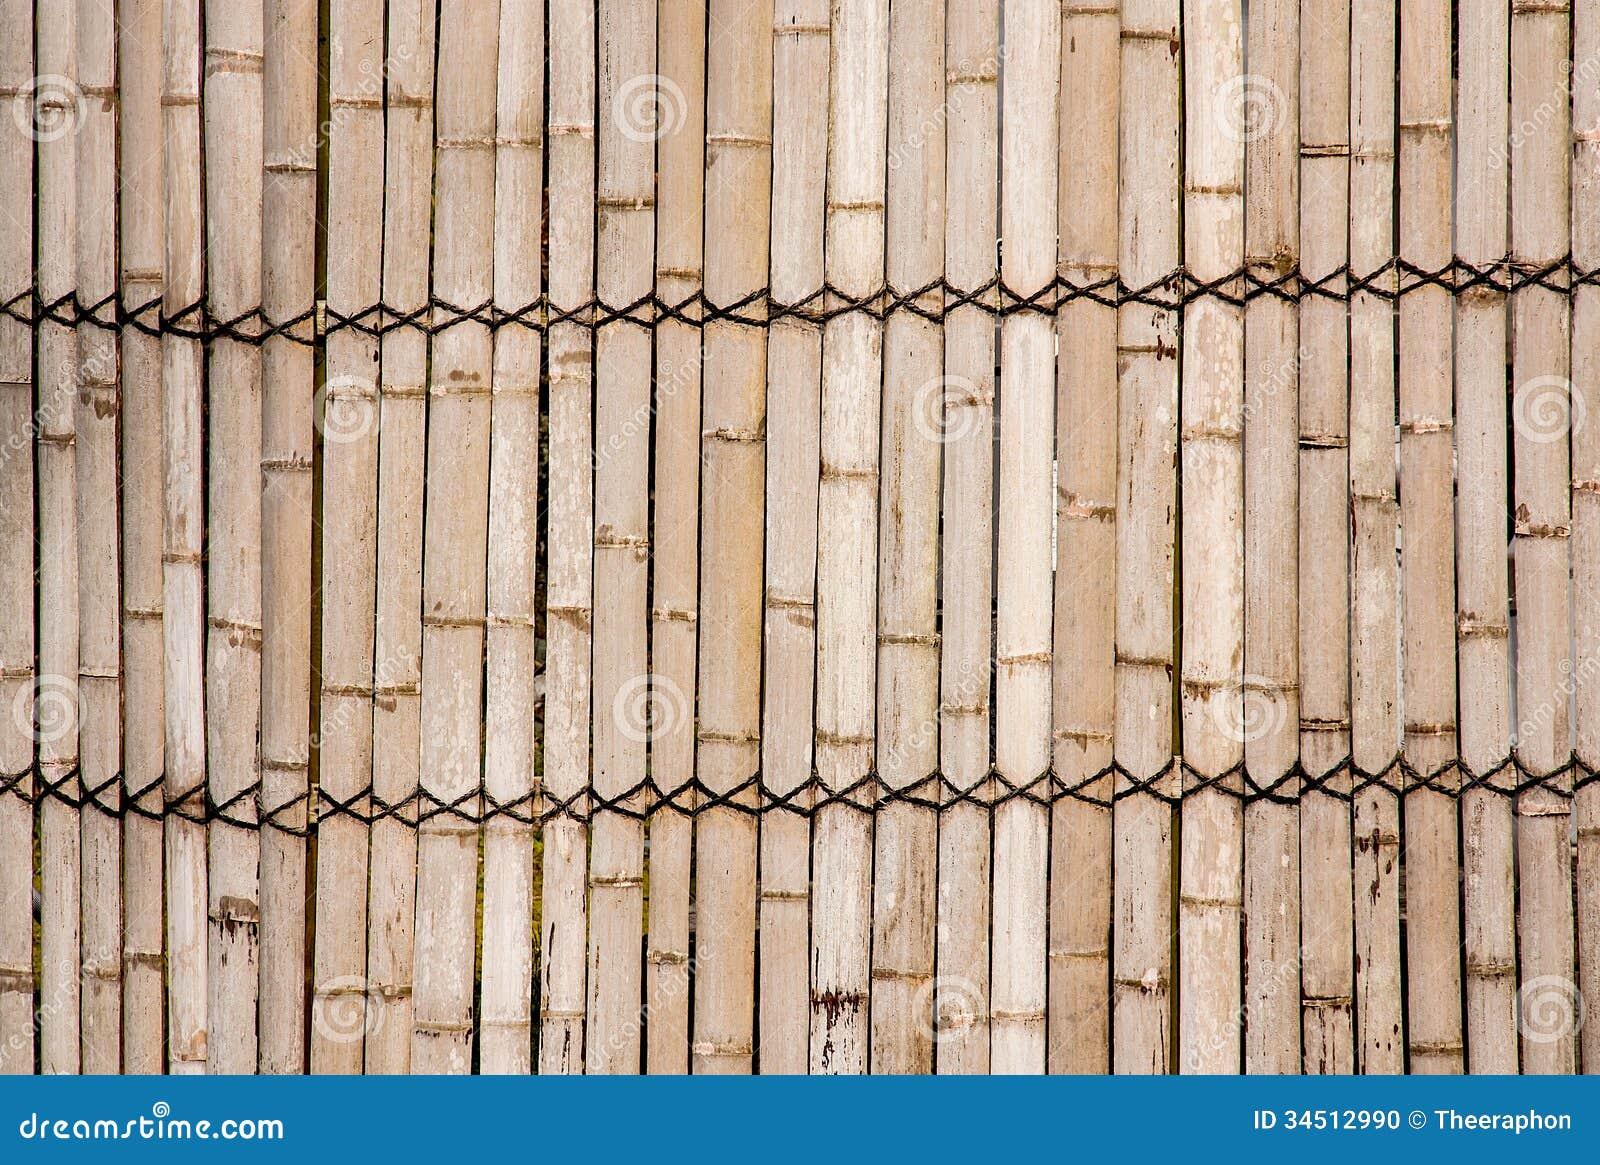 Bamboo Walls Stock Photo Image Of Bunch Pattern